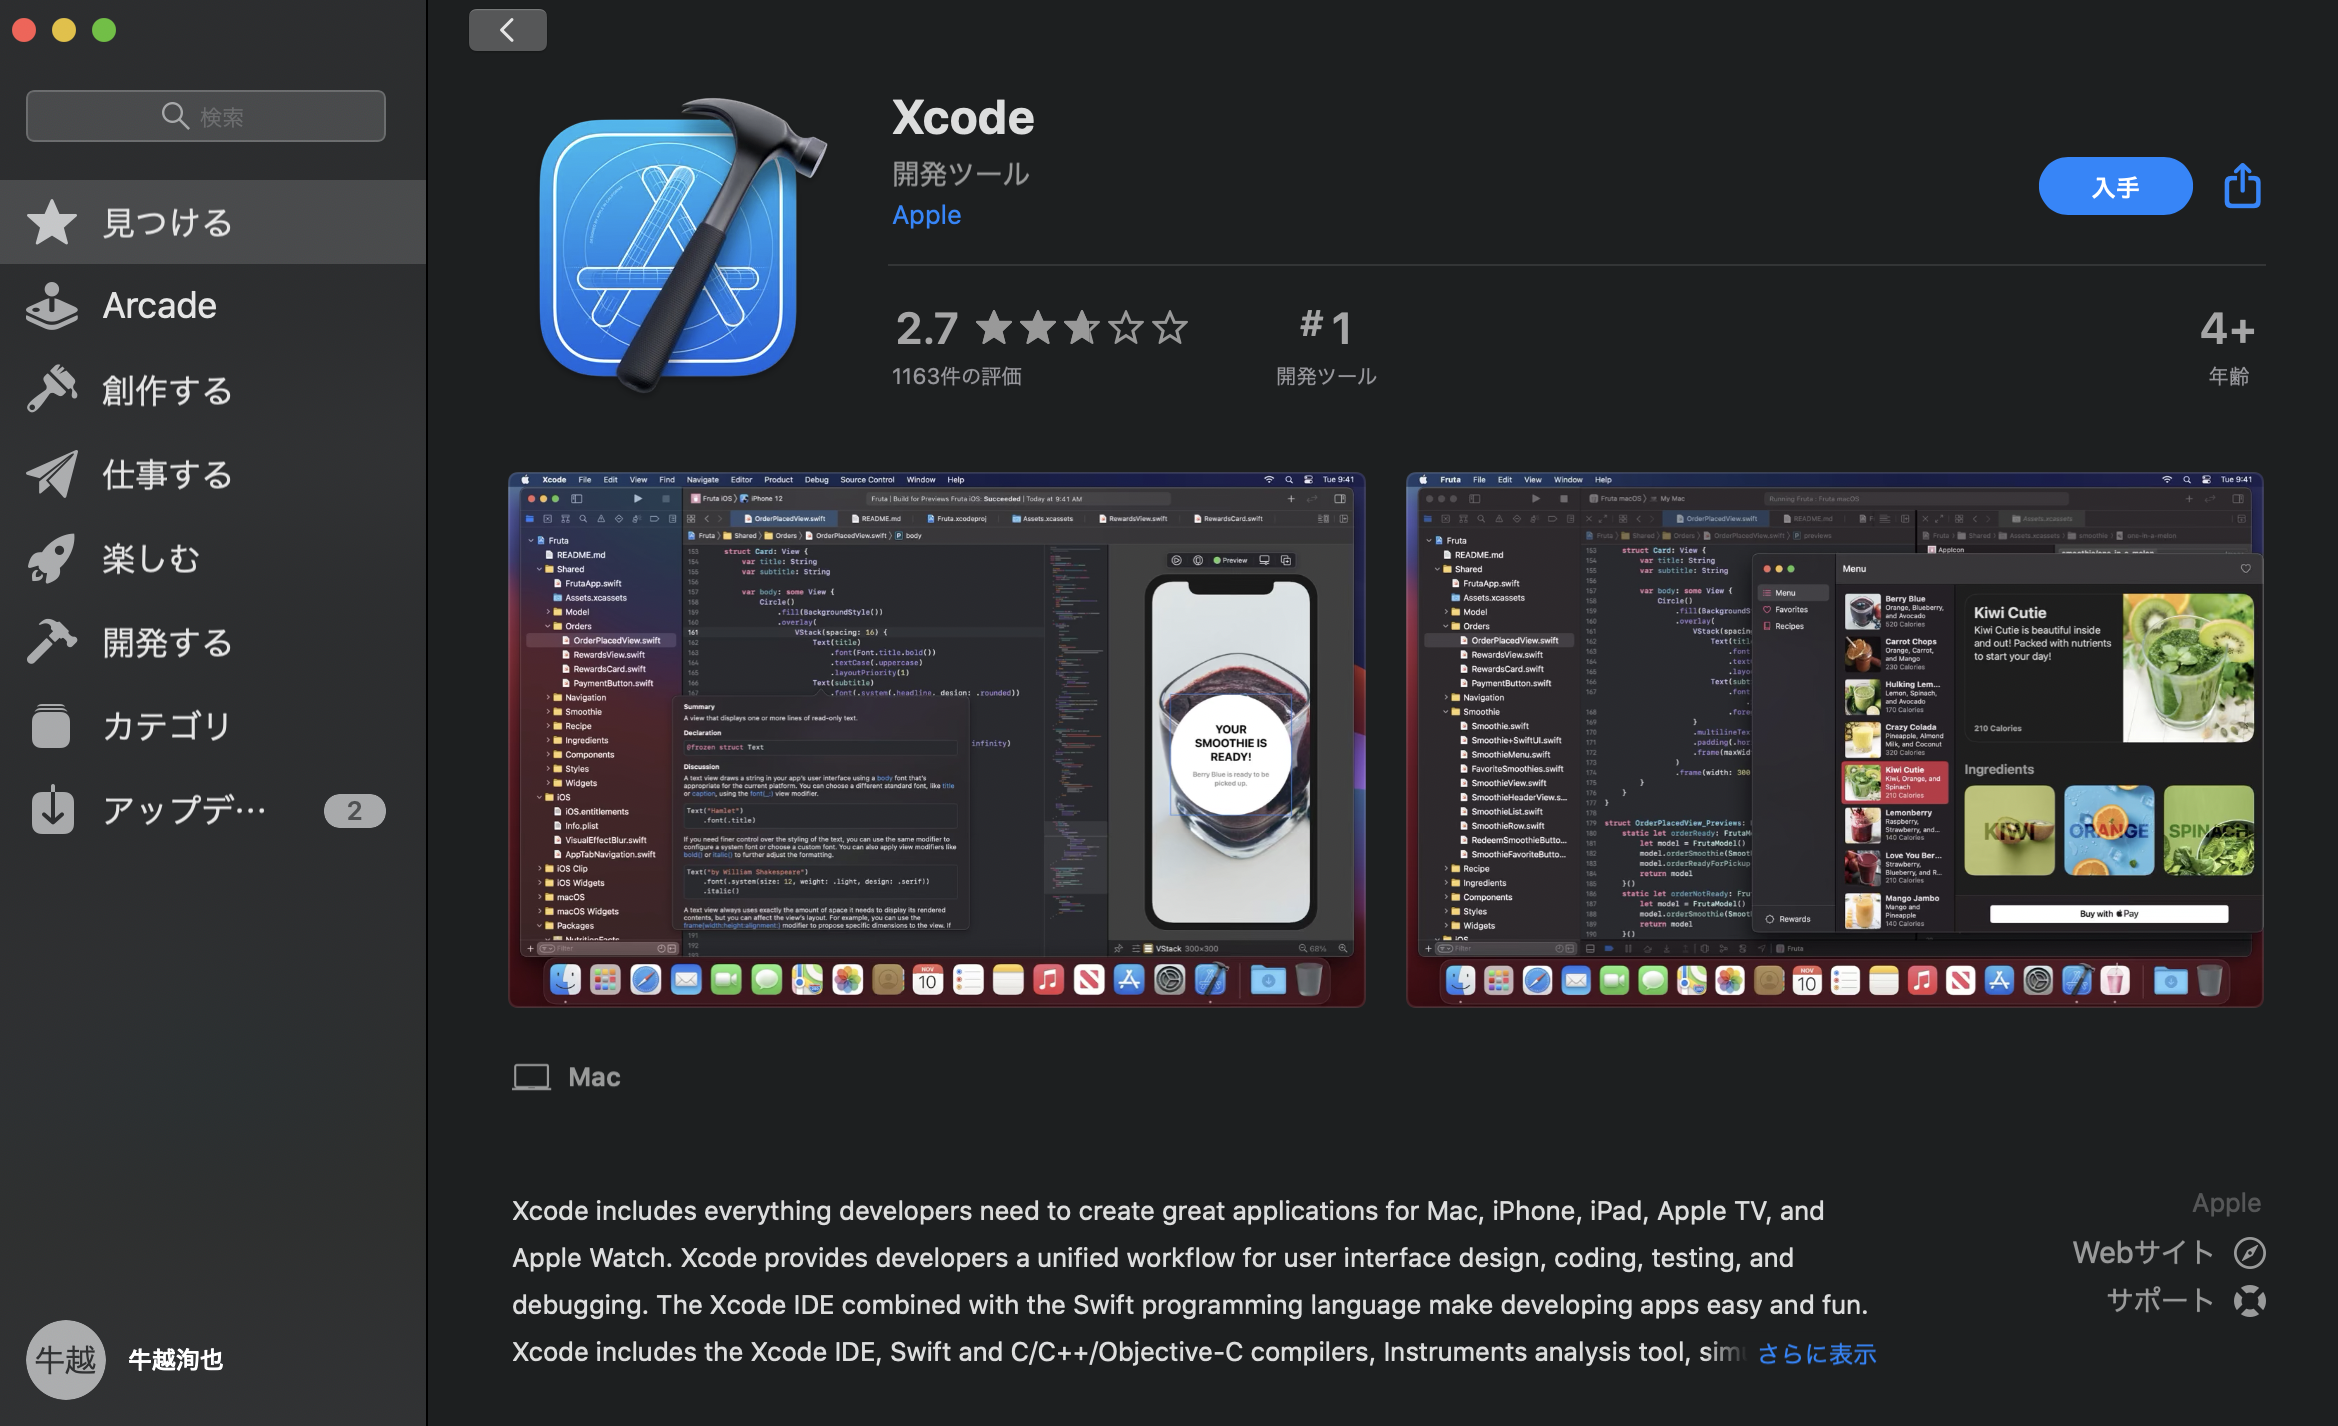 Xcode App Store